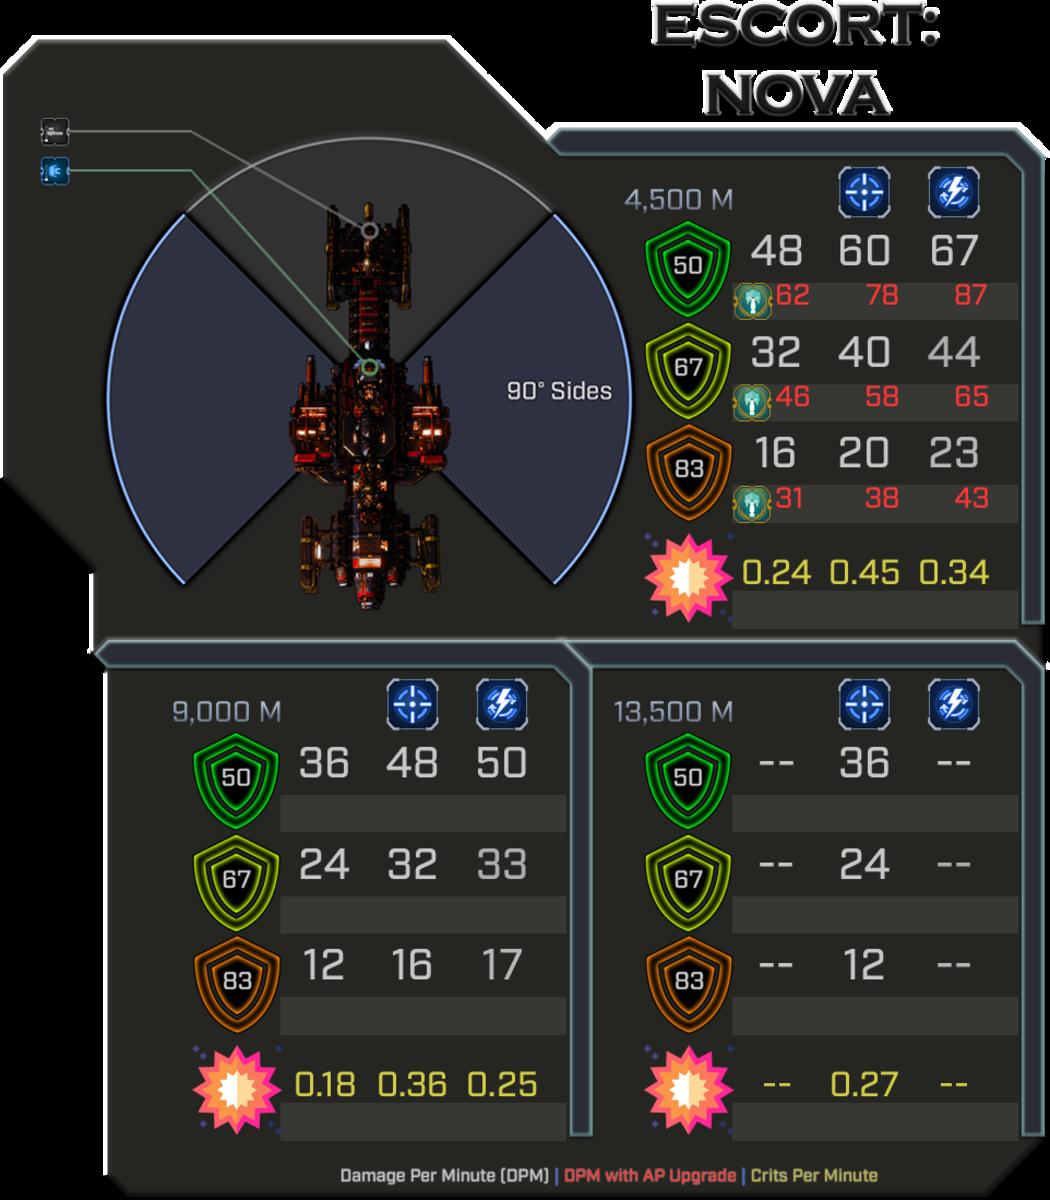 Ad-Mech Nova - Weapon Damage Profile (Sides)